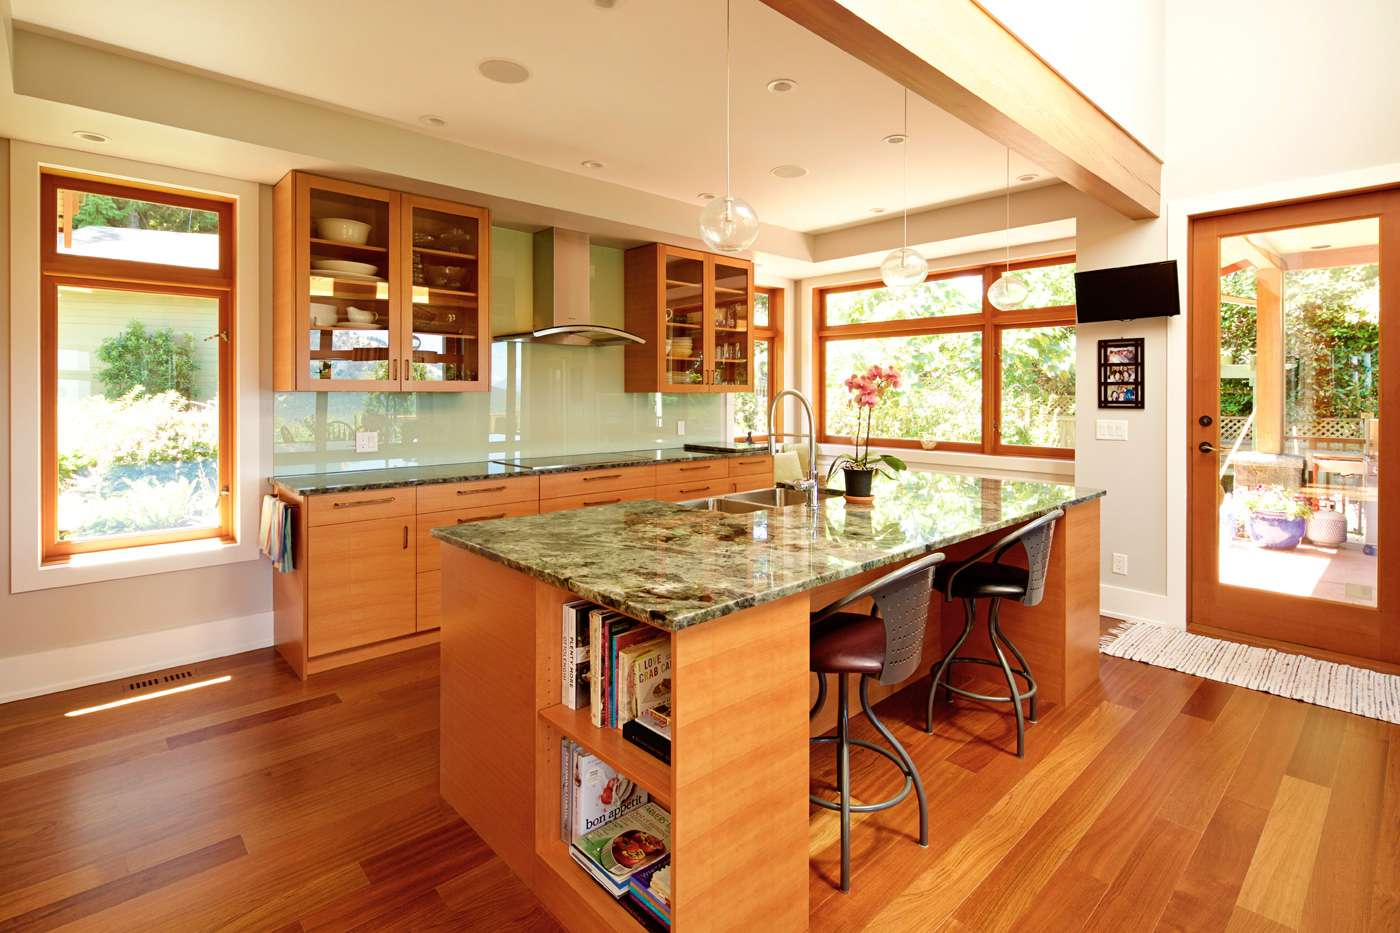 Warm wood and granite countertops